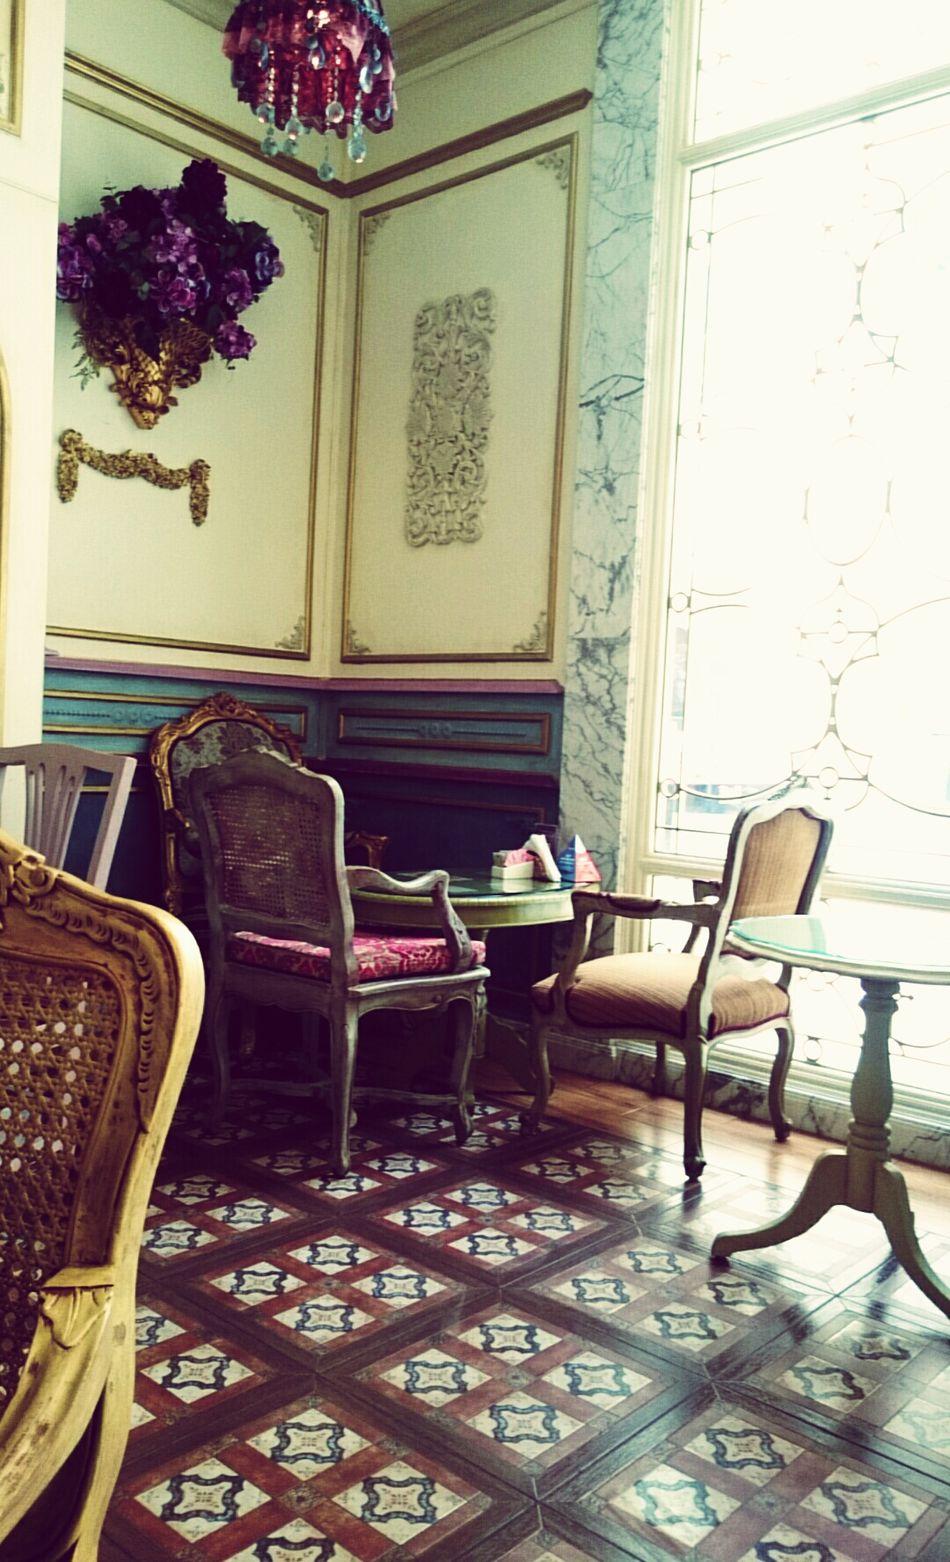 Decoration Decorتصويري  ابوظبي Yas Mall ياس مول Taking Photos Takenbyme Shekspear Cafe Cafe Time